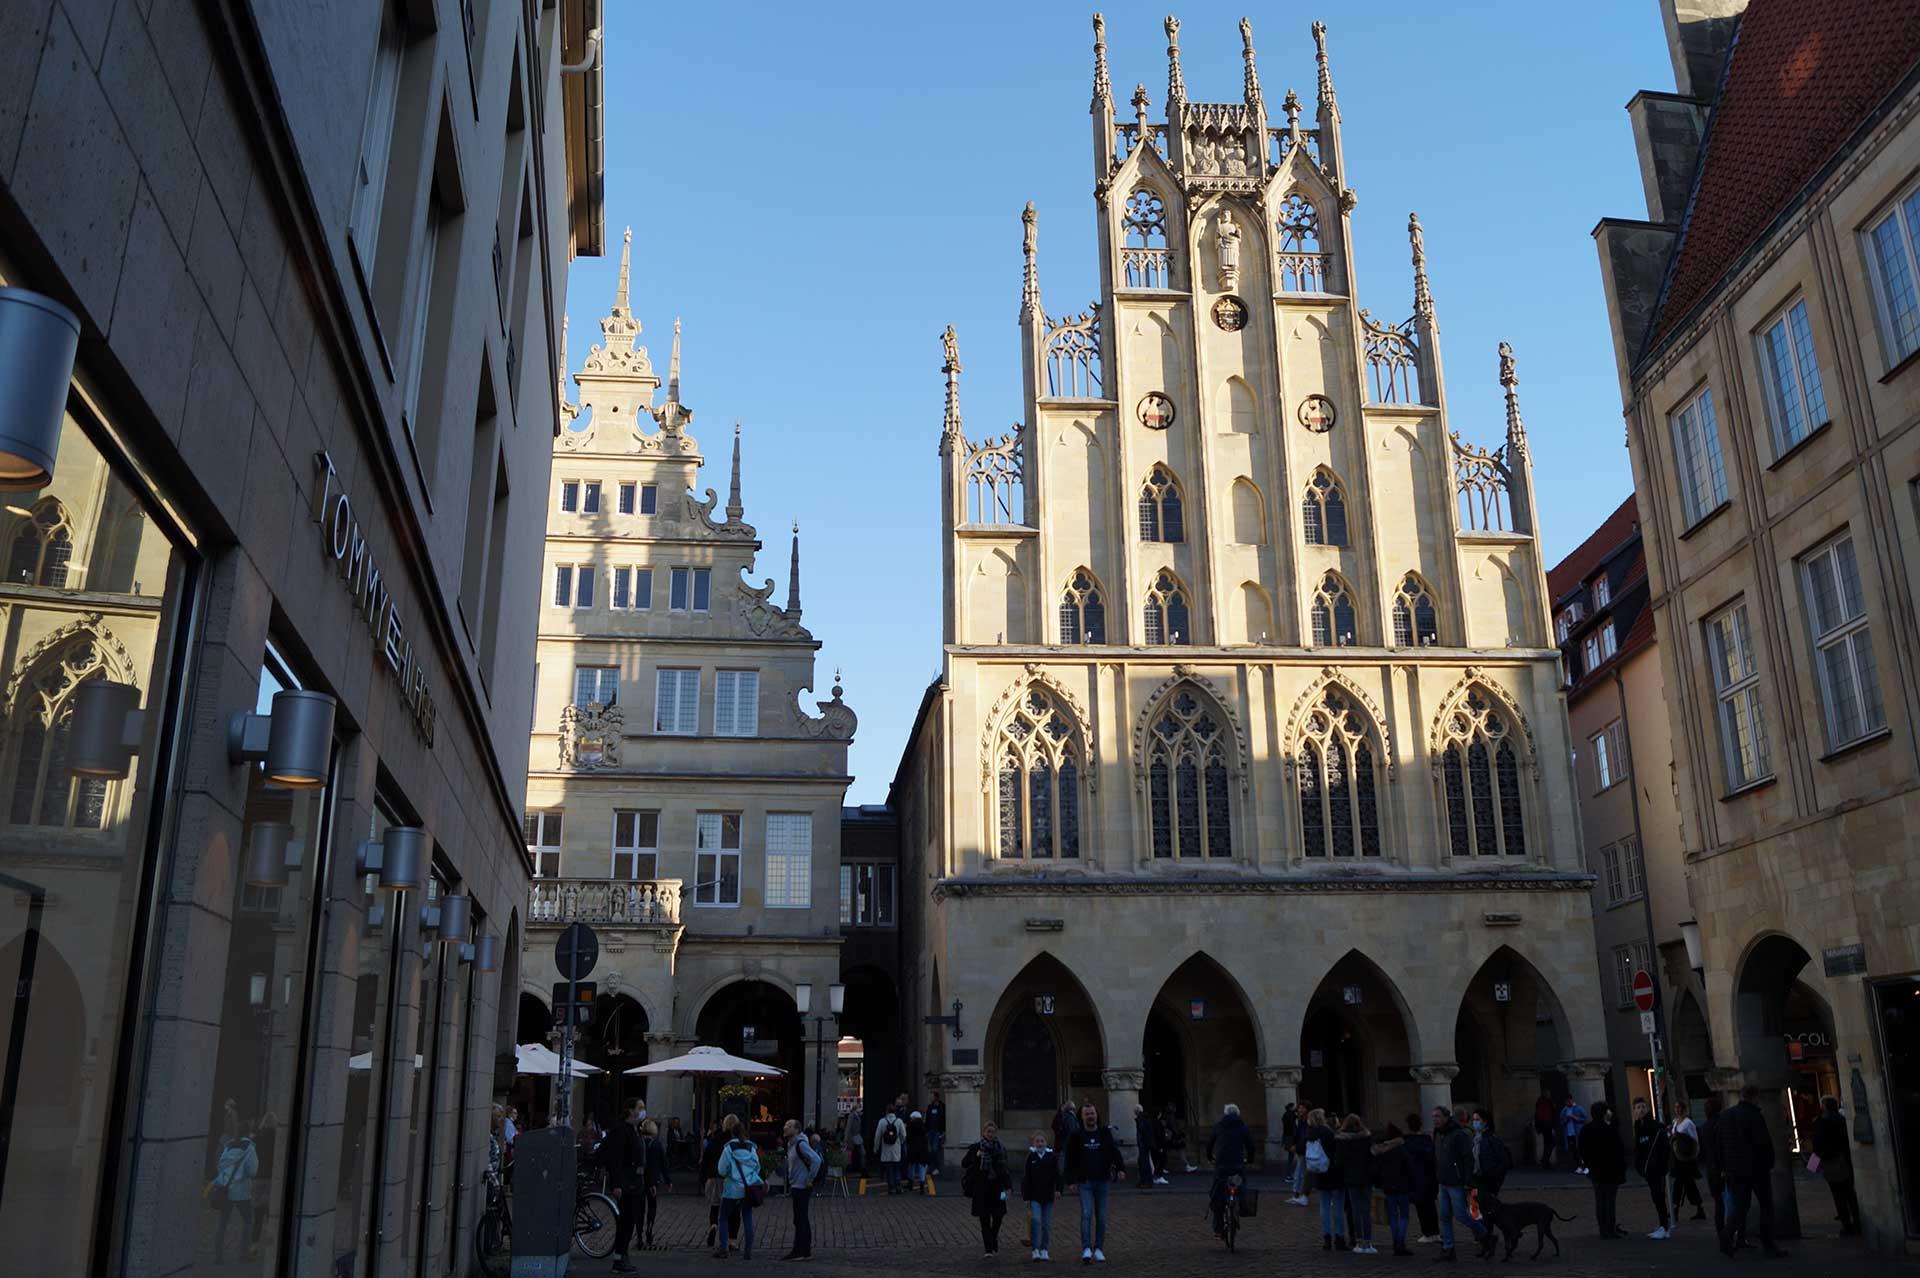 The Münster City Hall at Prinzipalmarkt